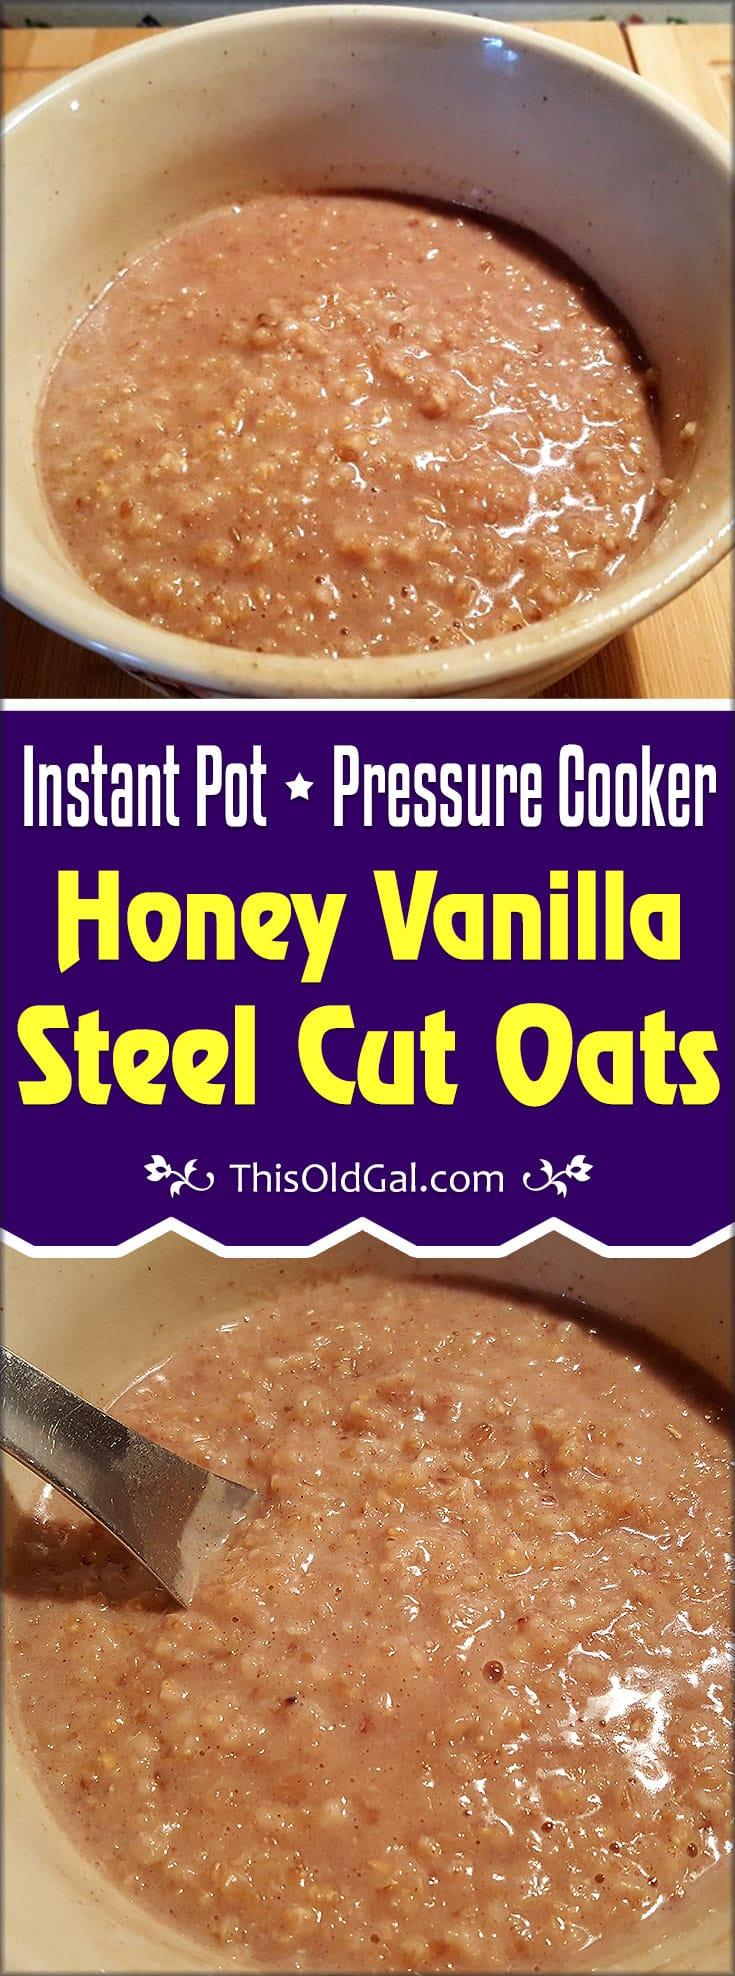 Pressure Cooker Honey Vanilla Steel Cut Oats This Old Gal